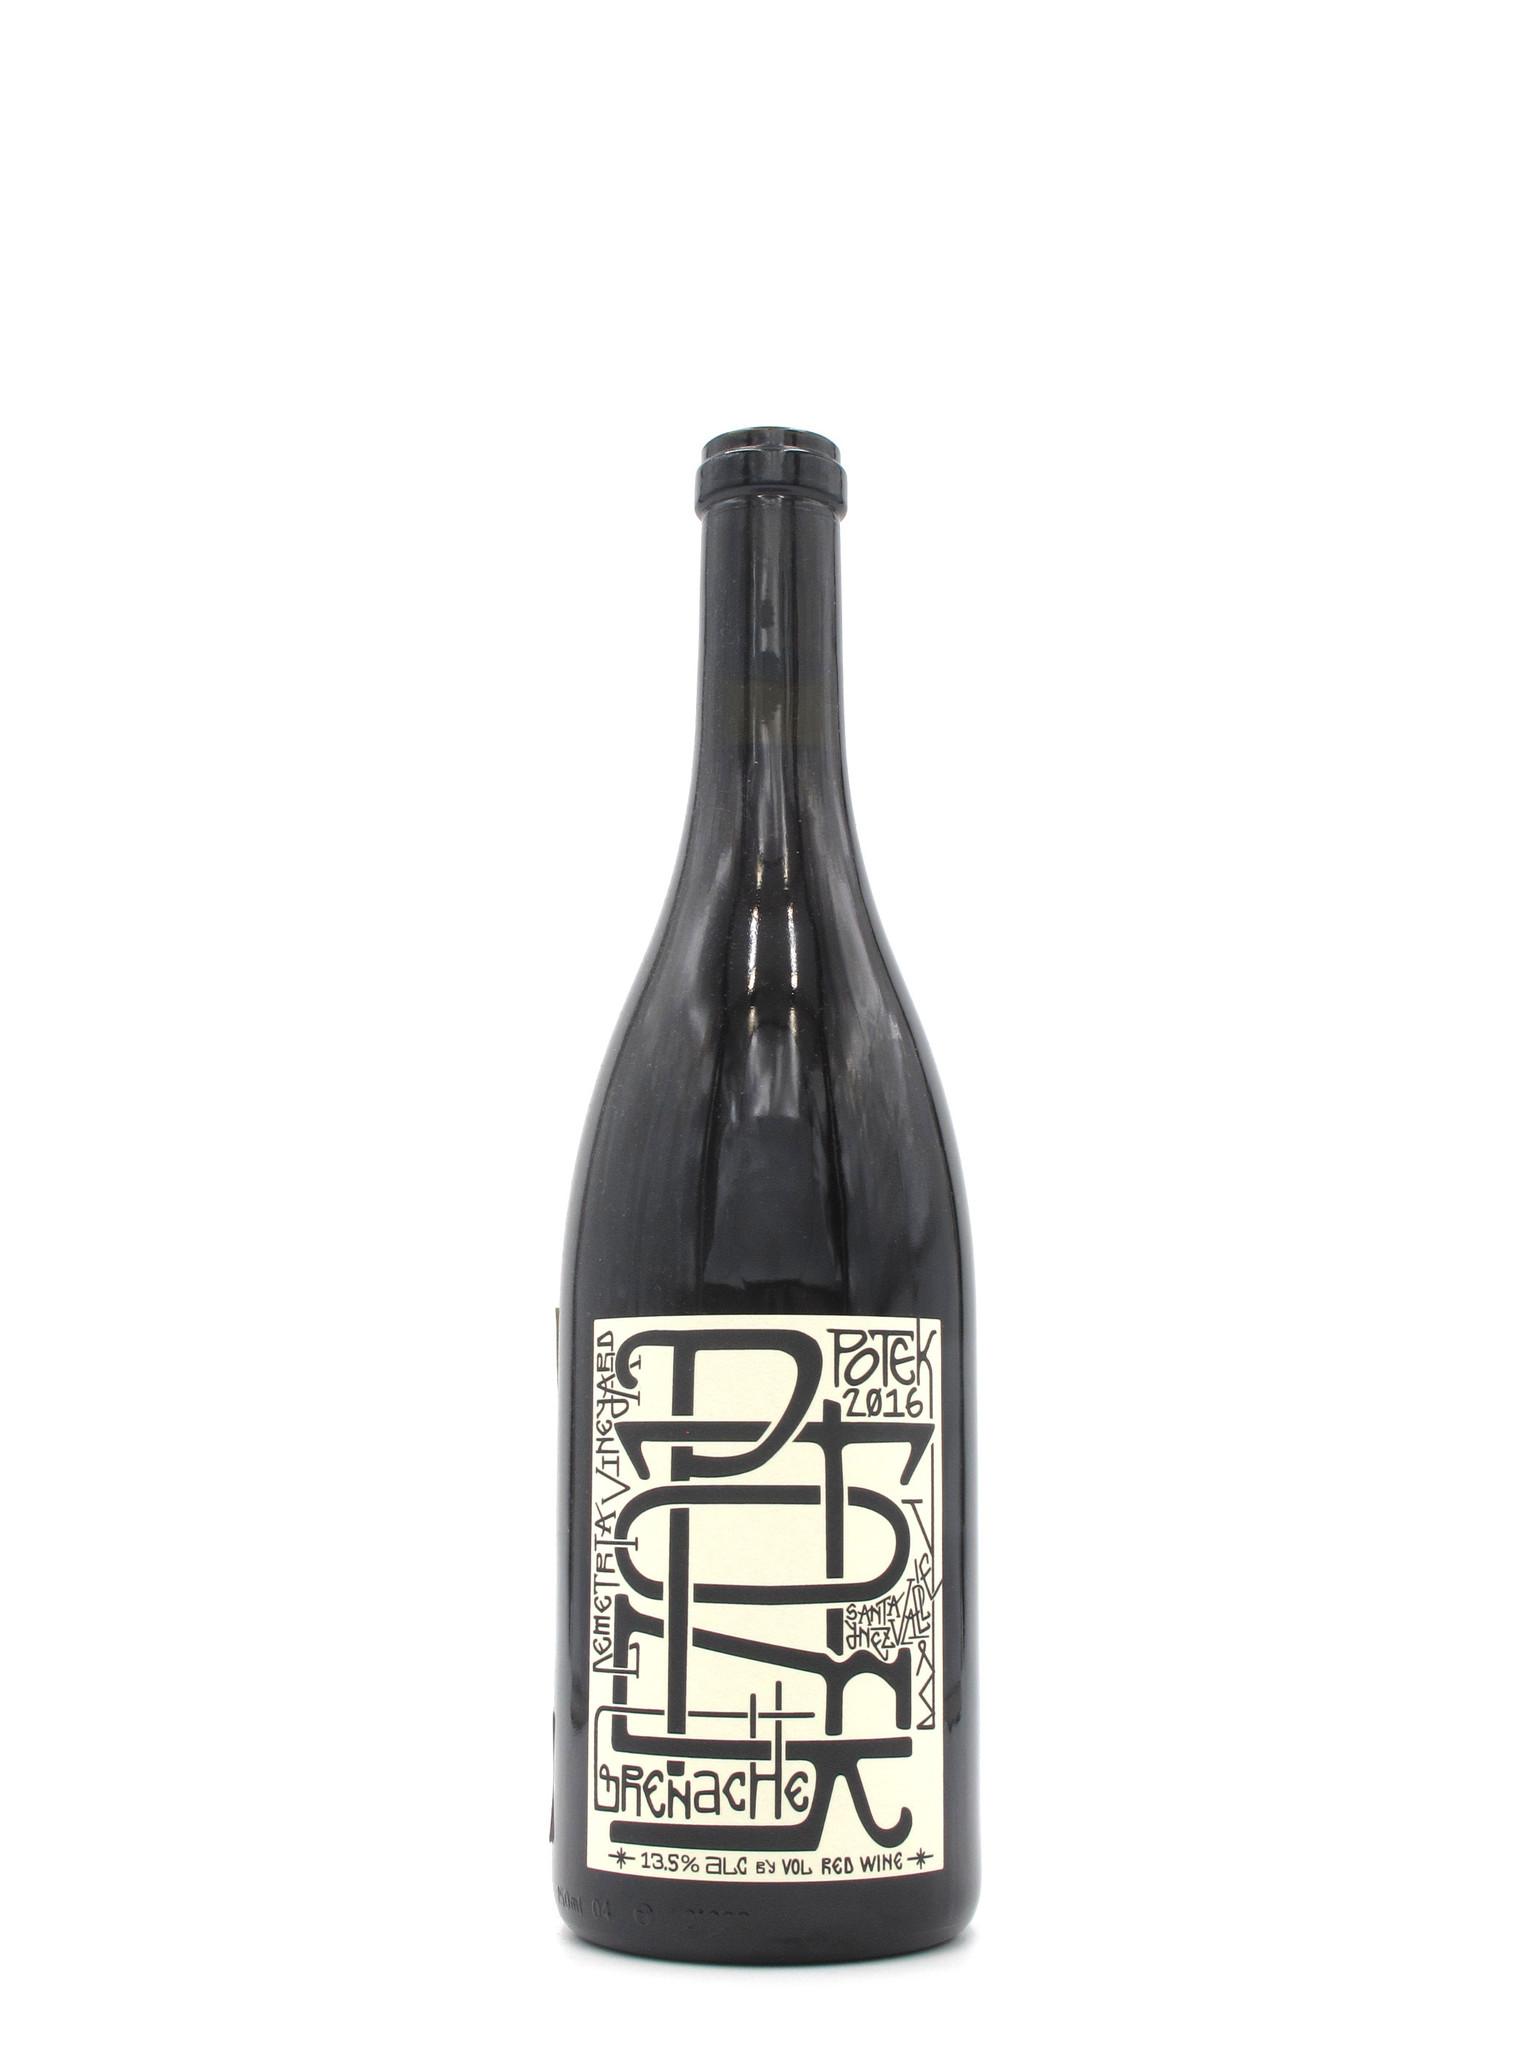 Potek Winery 2016 Potek Demetria Vineyard Grenache 750ml